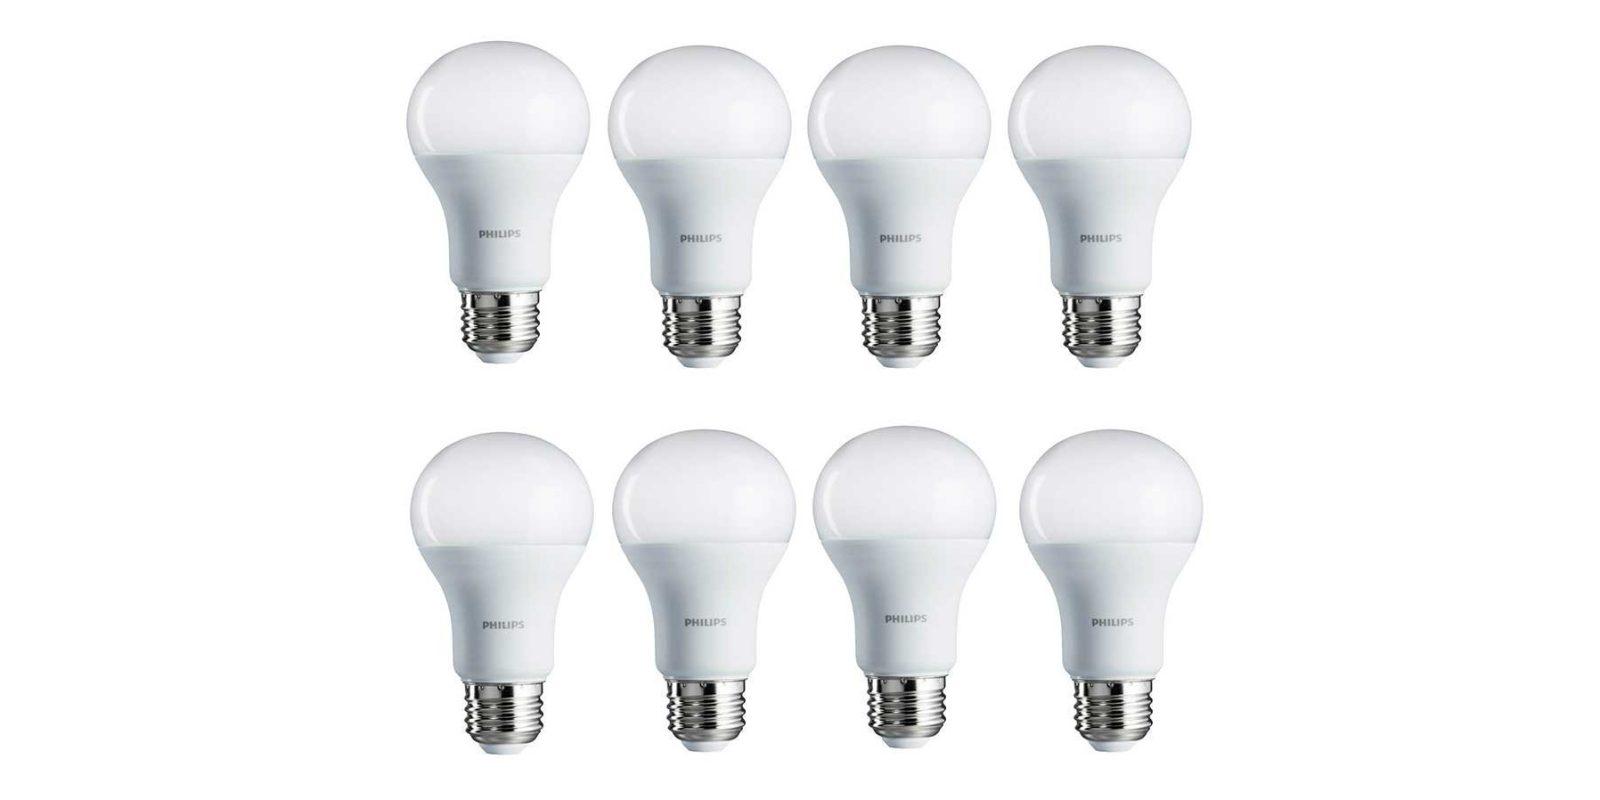 Green Deals: 8-pack Philips A19 100W Daylight LED Light Bulbs $29 ...